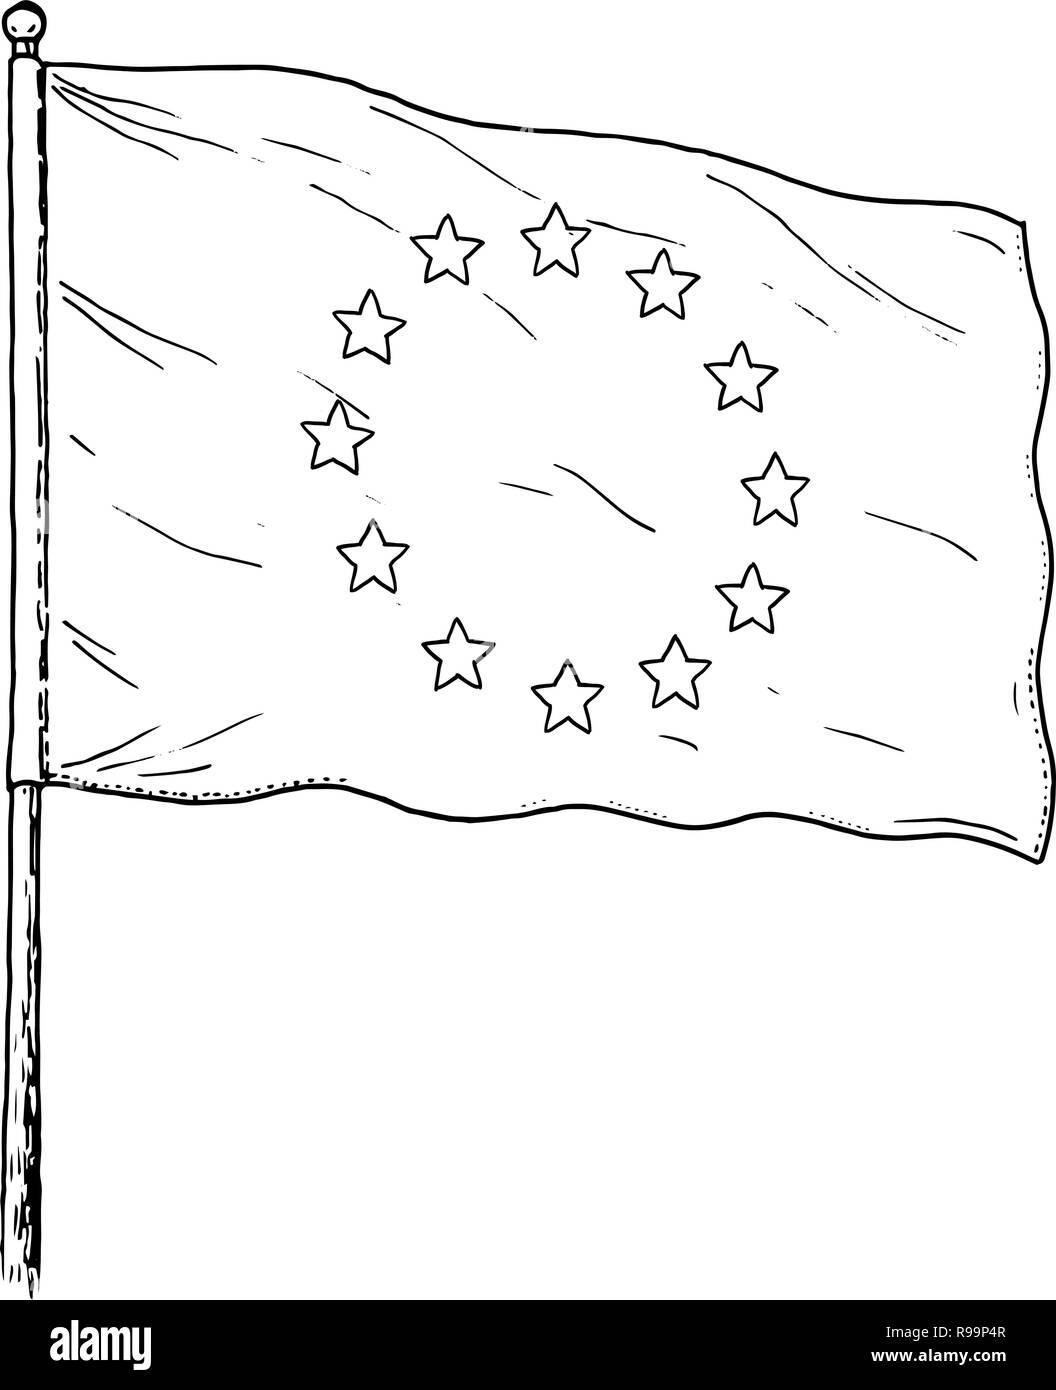 European Union flag drawing - vintage like illustration of flag of EU. Monochromatic banner contour on white background. - Stock Image